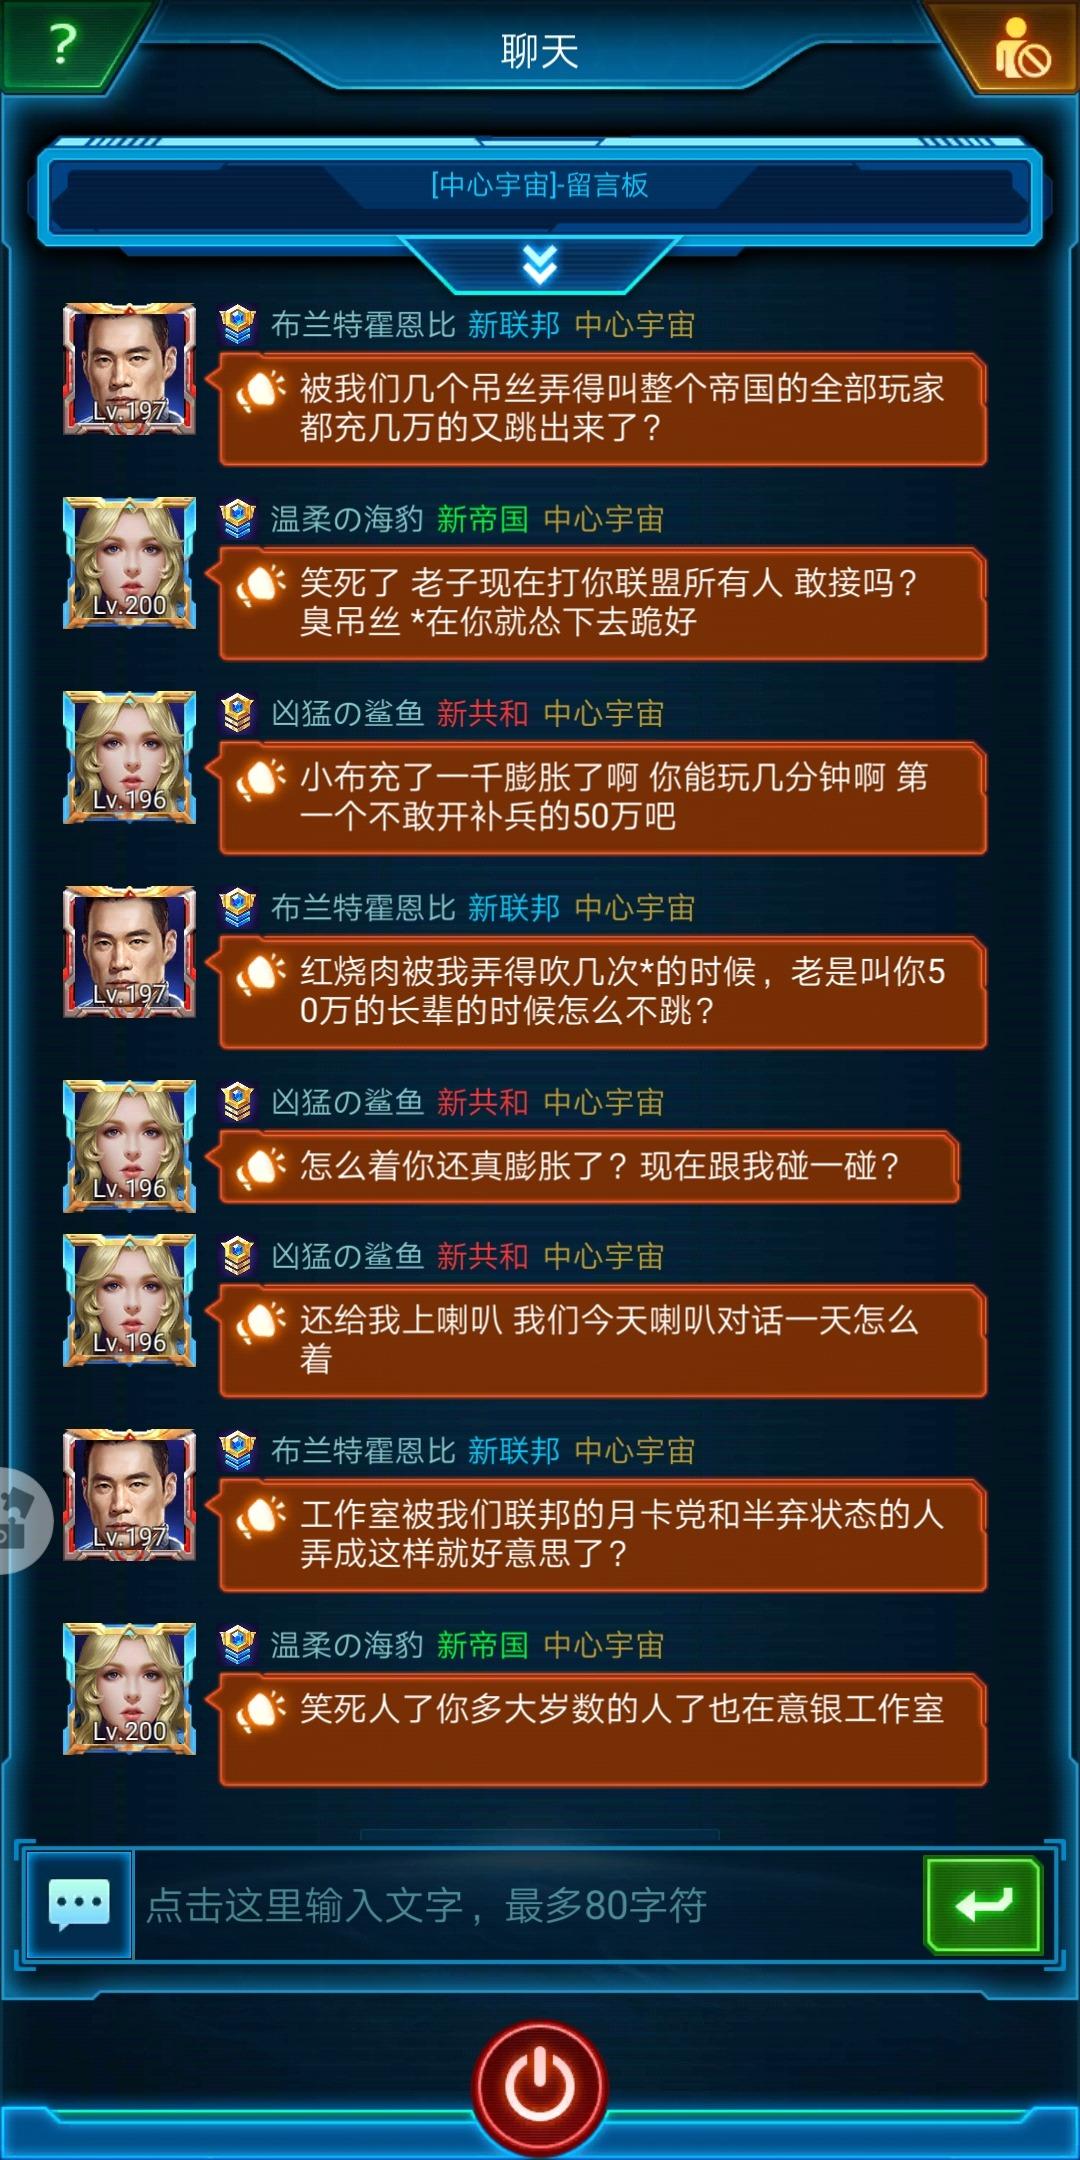 Screenshot_20191127_192622_com.jedigames.p16s.huawei.jpg